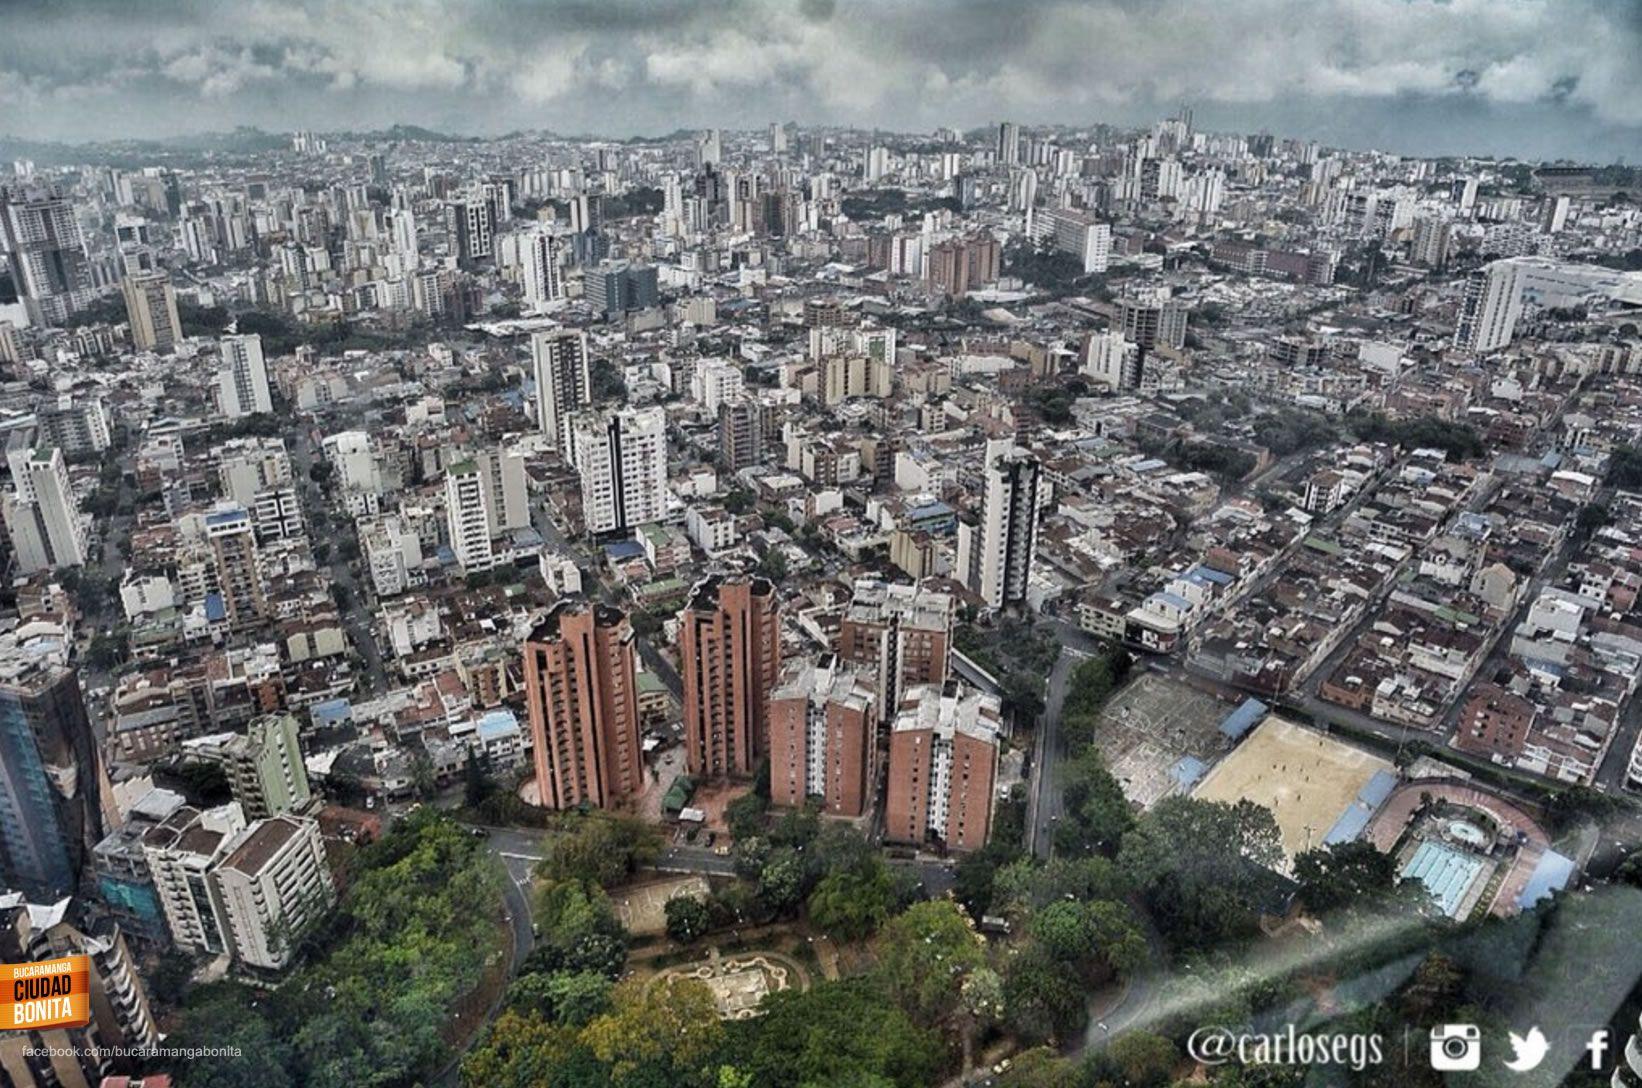 Bucaramanga, qué hermosa eres !!!! Gracias @carlosegs por la foto #bucaramangabonita